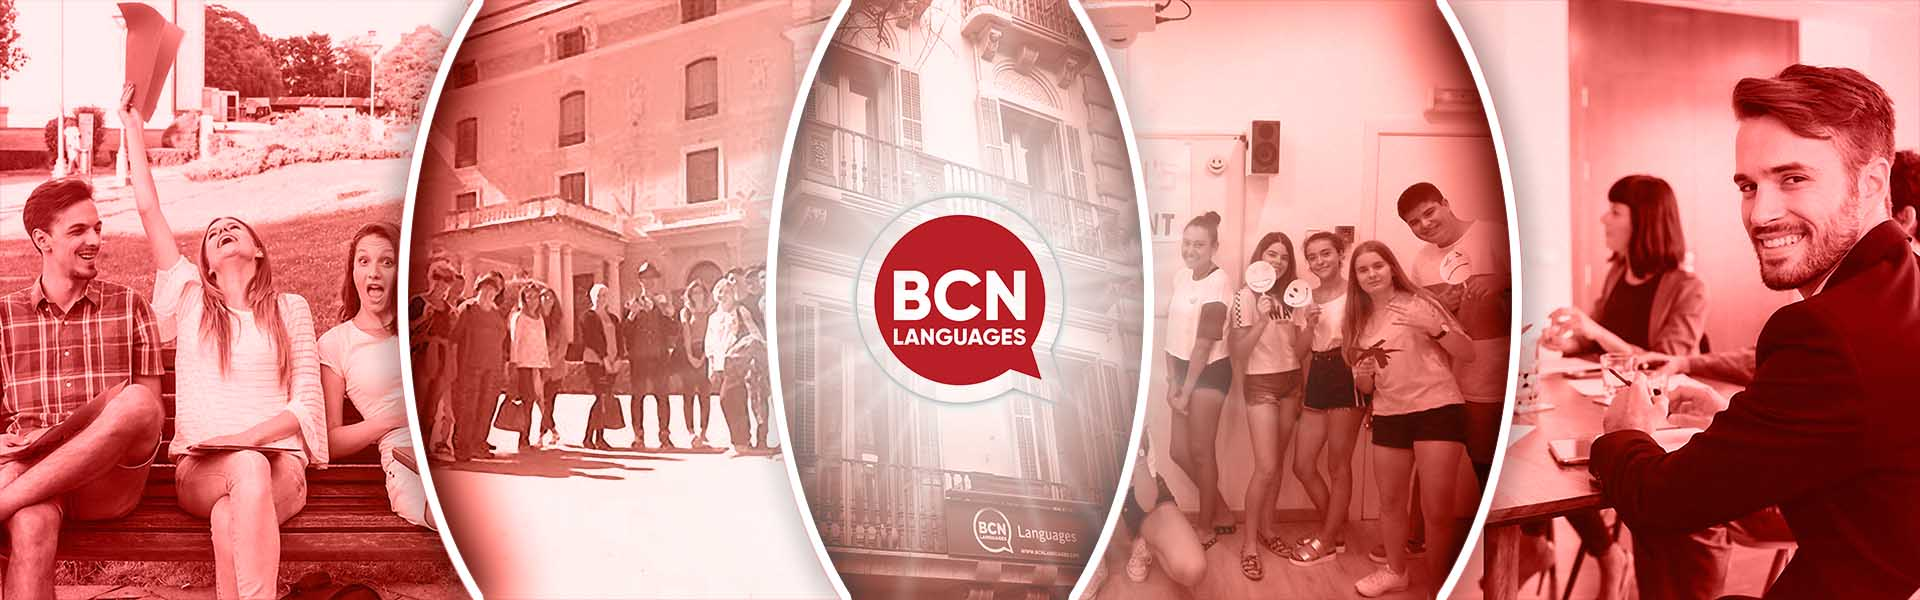 BCN Languages Barcelona Dil Okulu